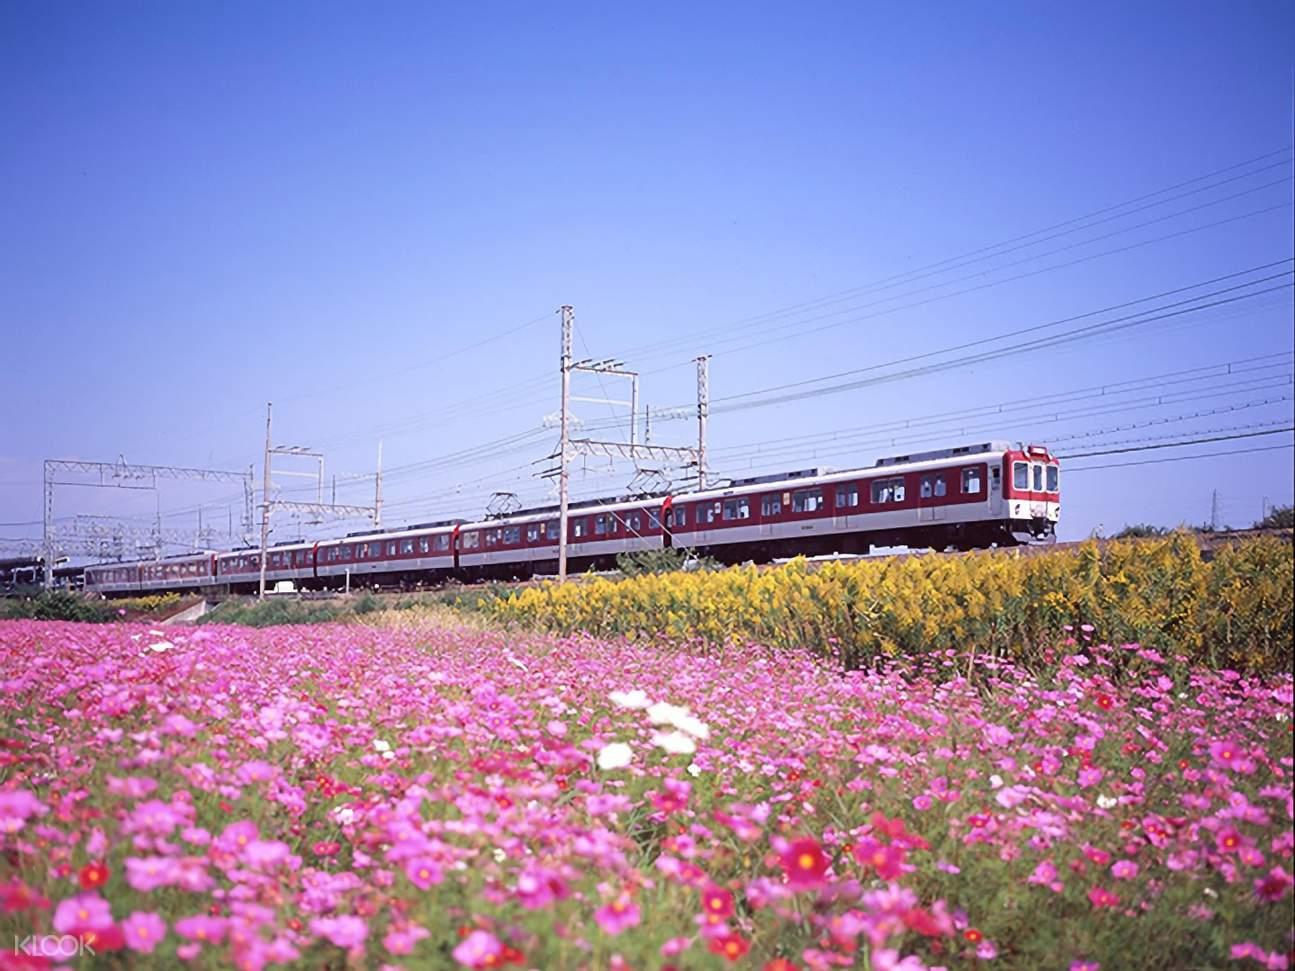 Kintetsu Railway with view of flowers